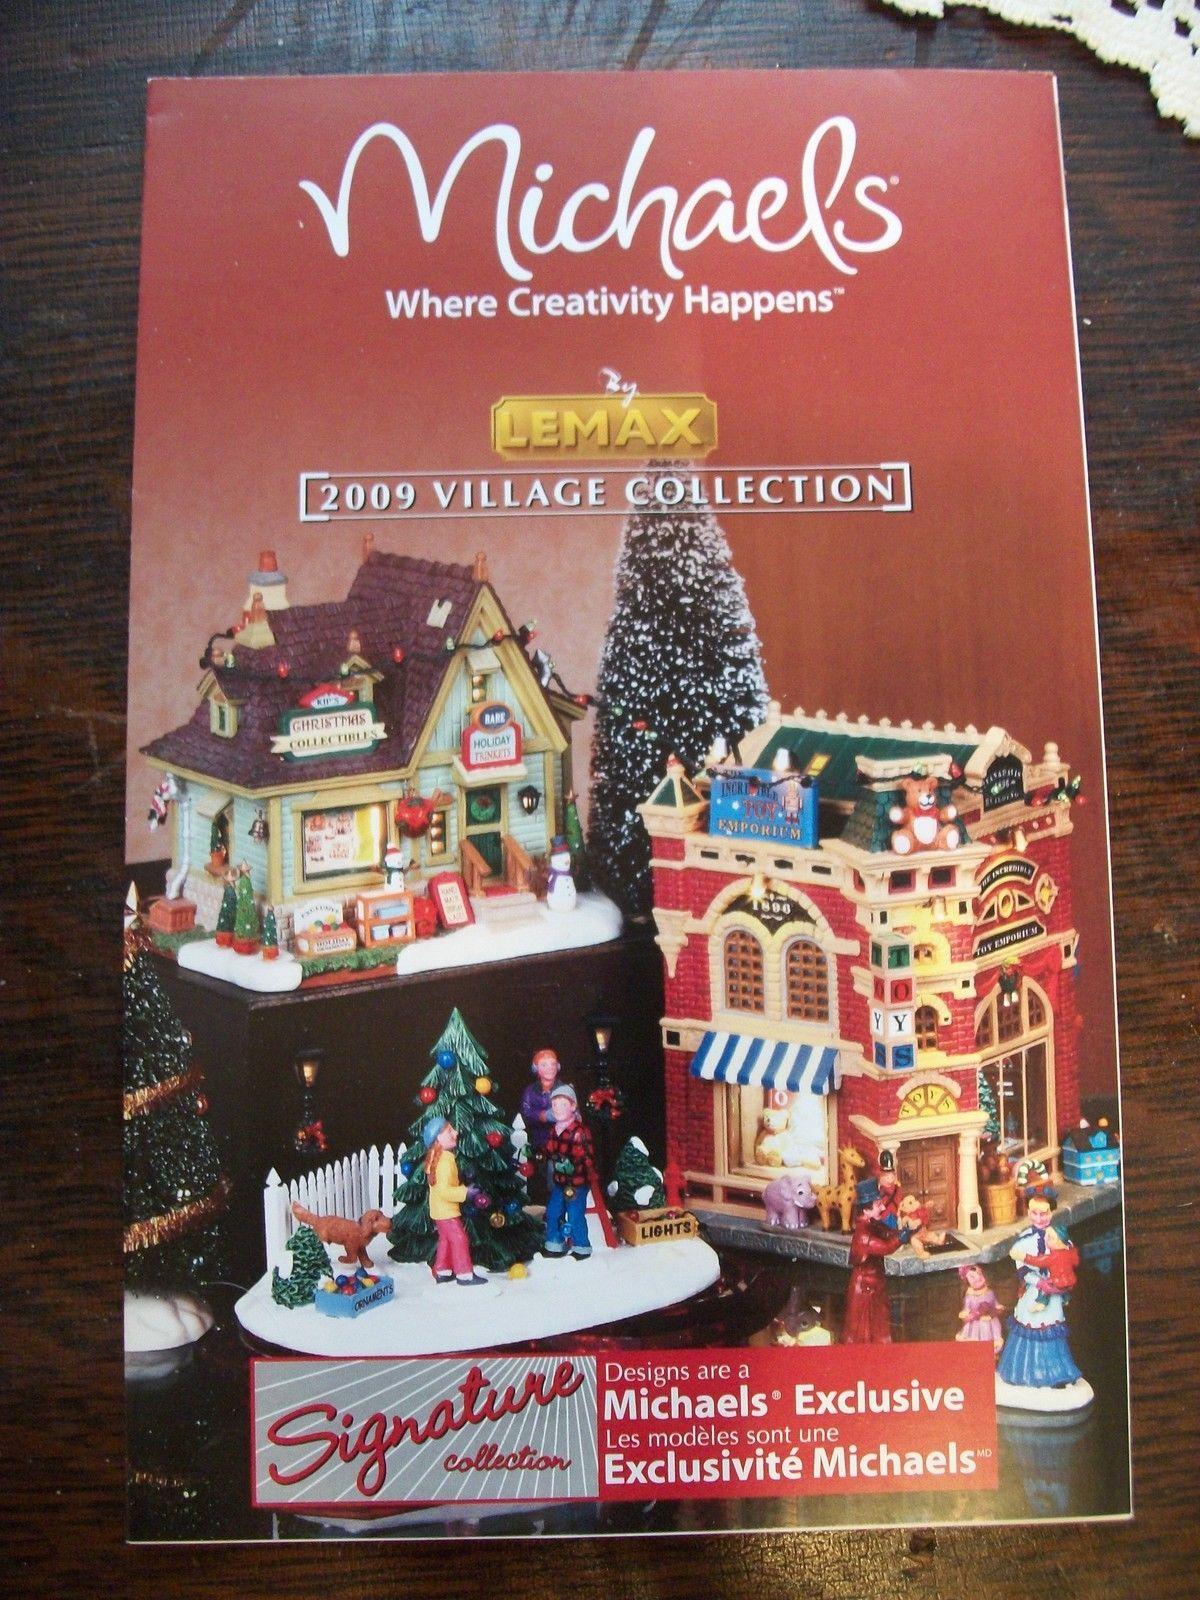 lemax michaels christmas village 2009 product brochure catalog - Michaels Christmas Village